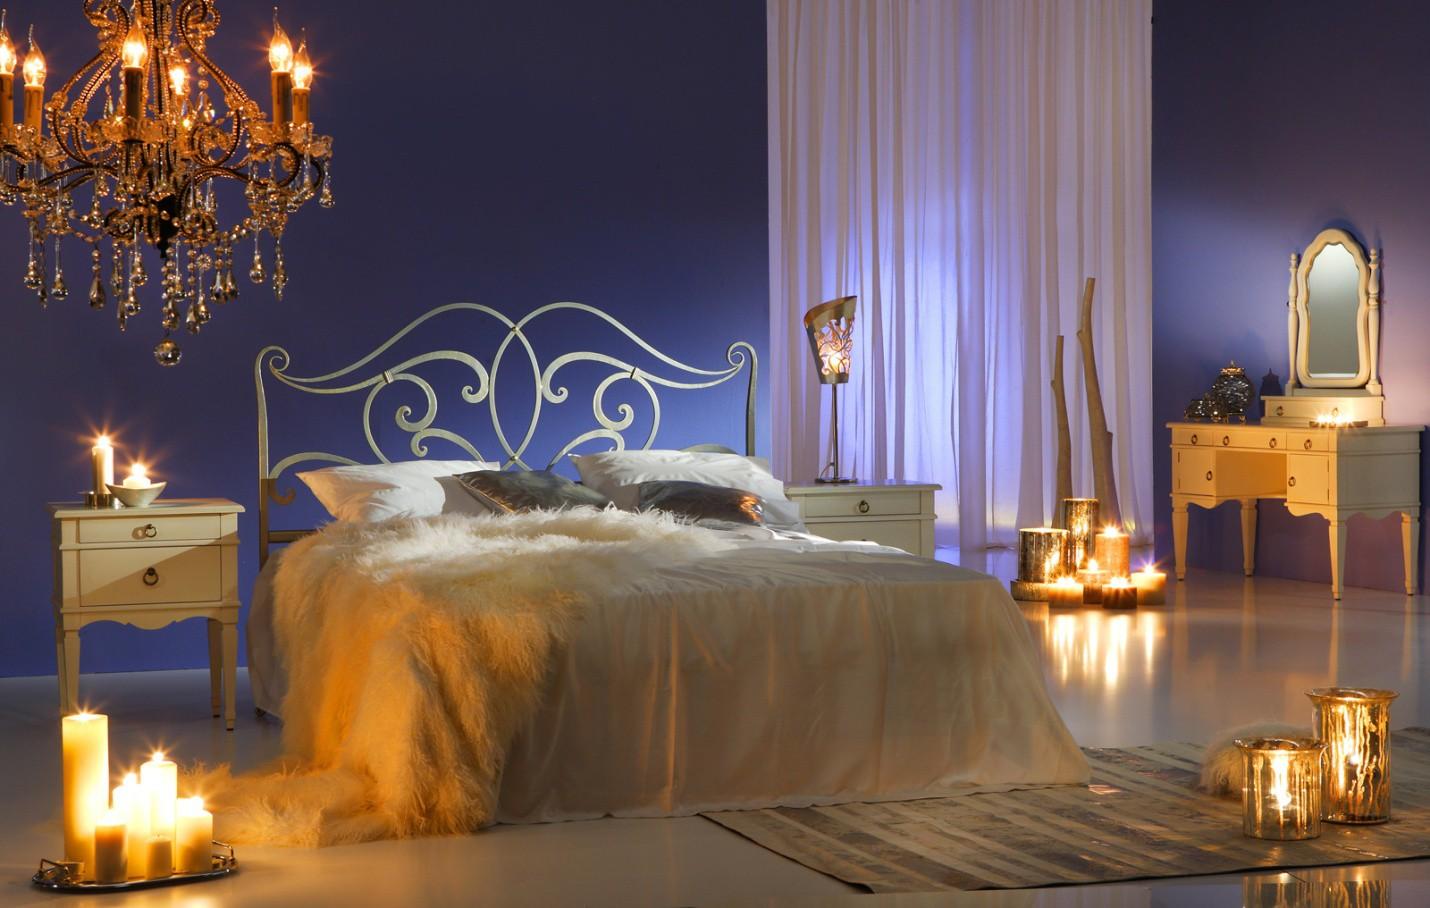 Нежная, тонкая романтичная спальня для молодой пары